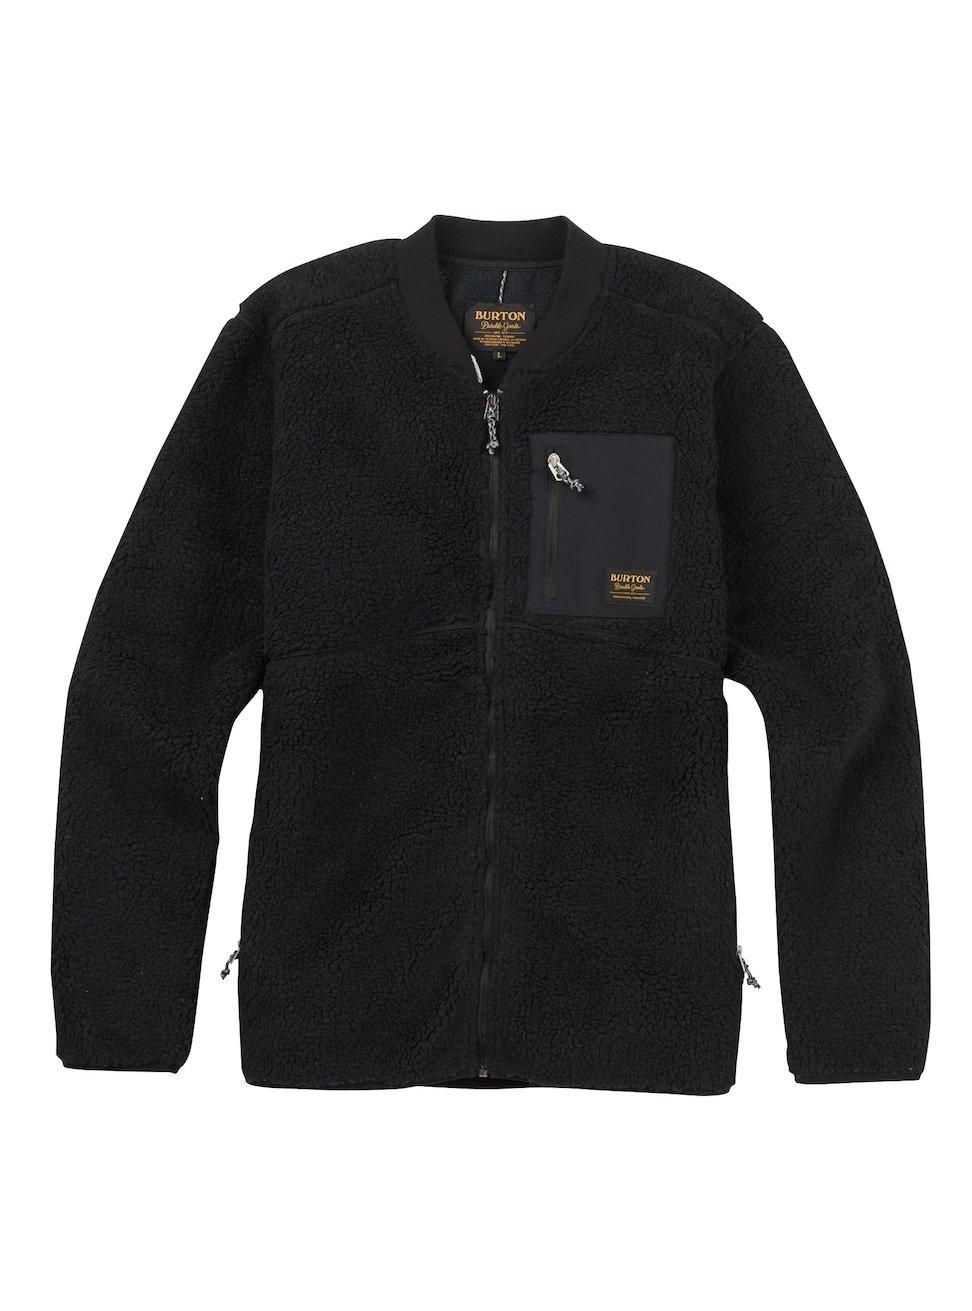 Burton Grove Full-Zip Fleece, True Black, Small